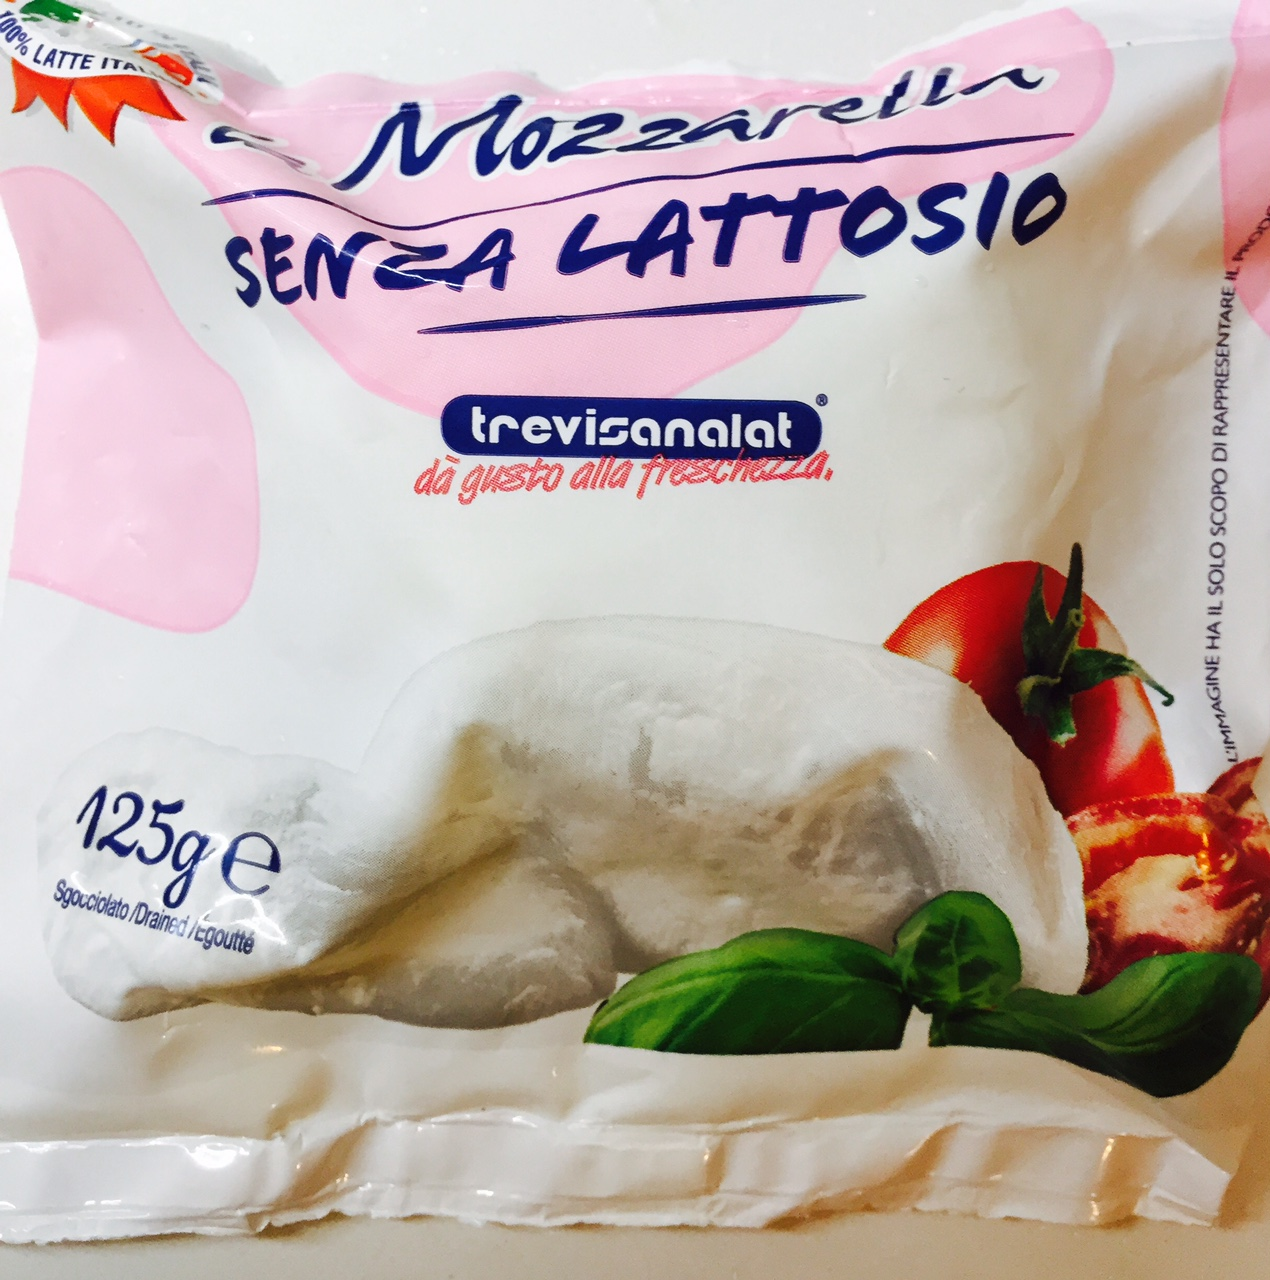 Mozzarella Trevisanalat - lattosio <0,01 Image